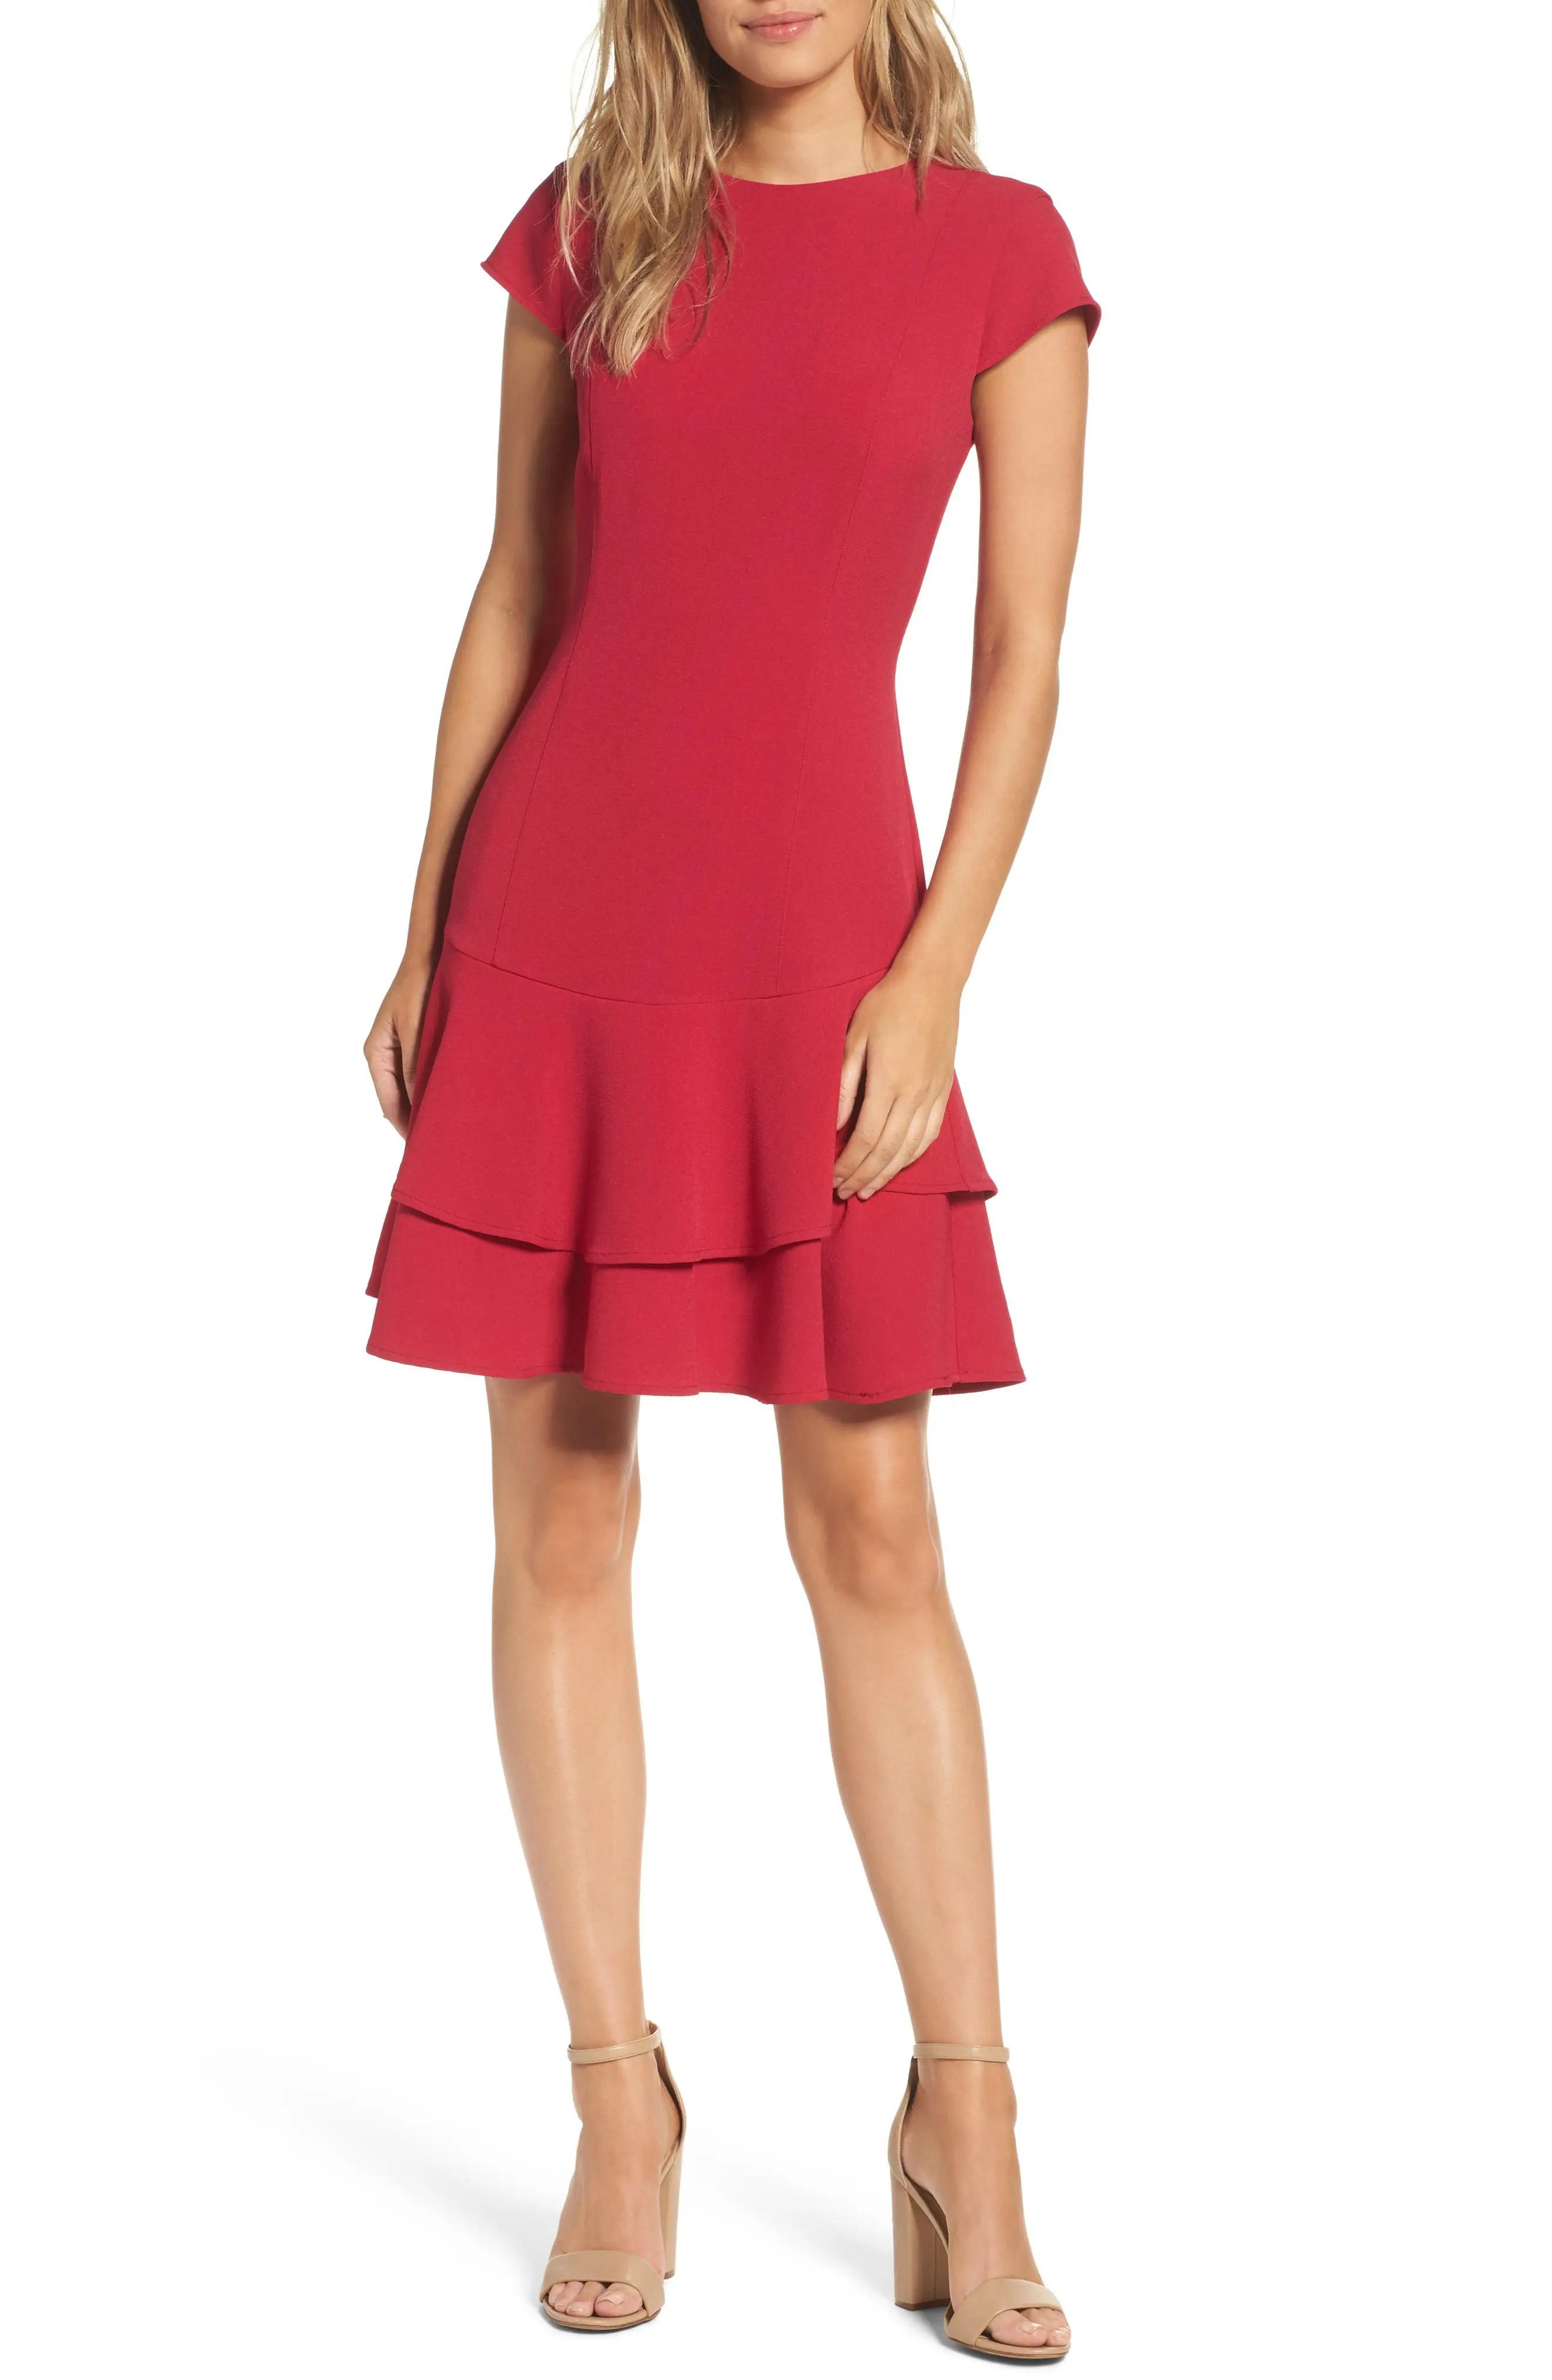 Eliza  stretch crepe sheath dress regular  petite also size clothing for women nordstrom rh shoprdstrom